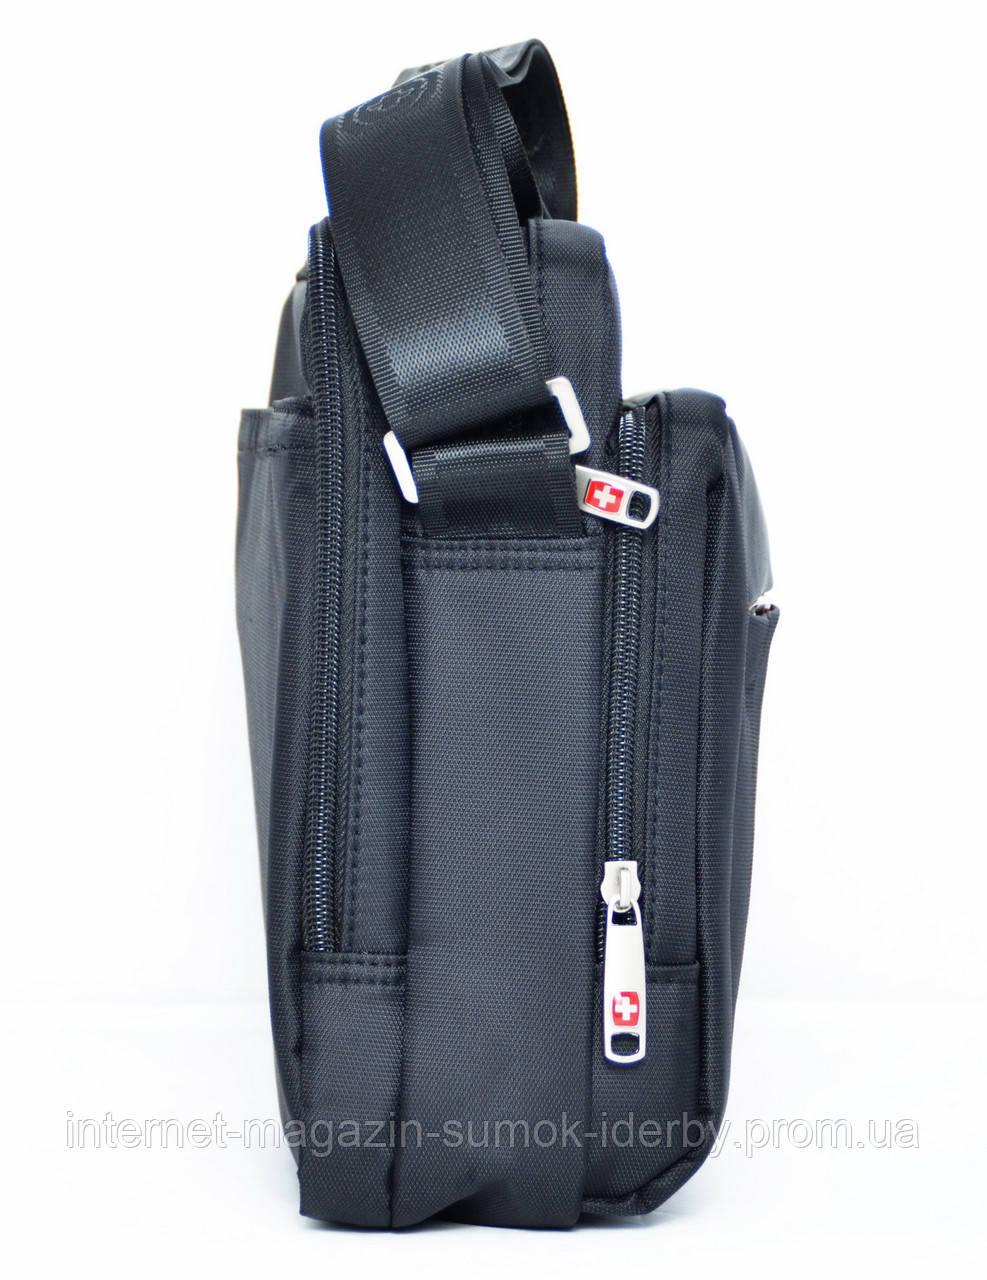 ff6c87ad Swissgear Сумка мужская планшет А5 Wenger-Noble W6605 black купить с ...